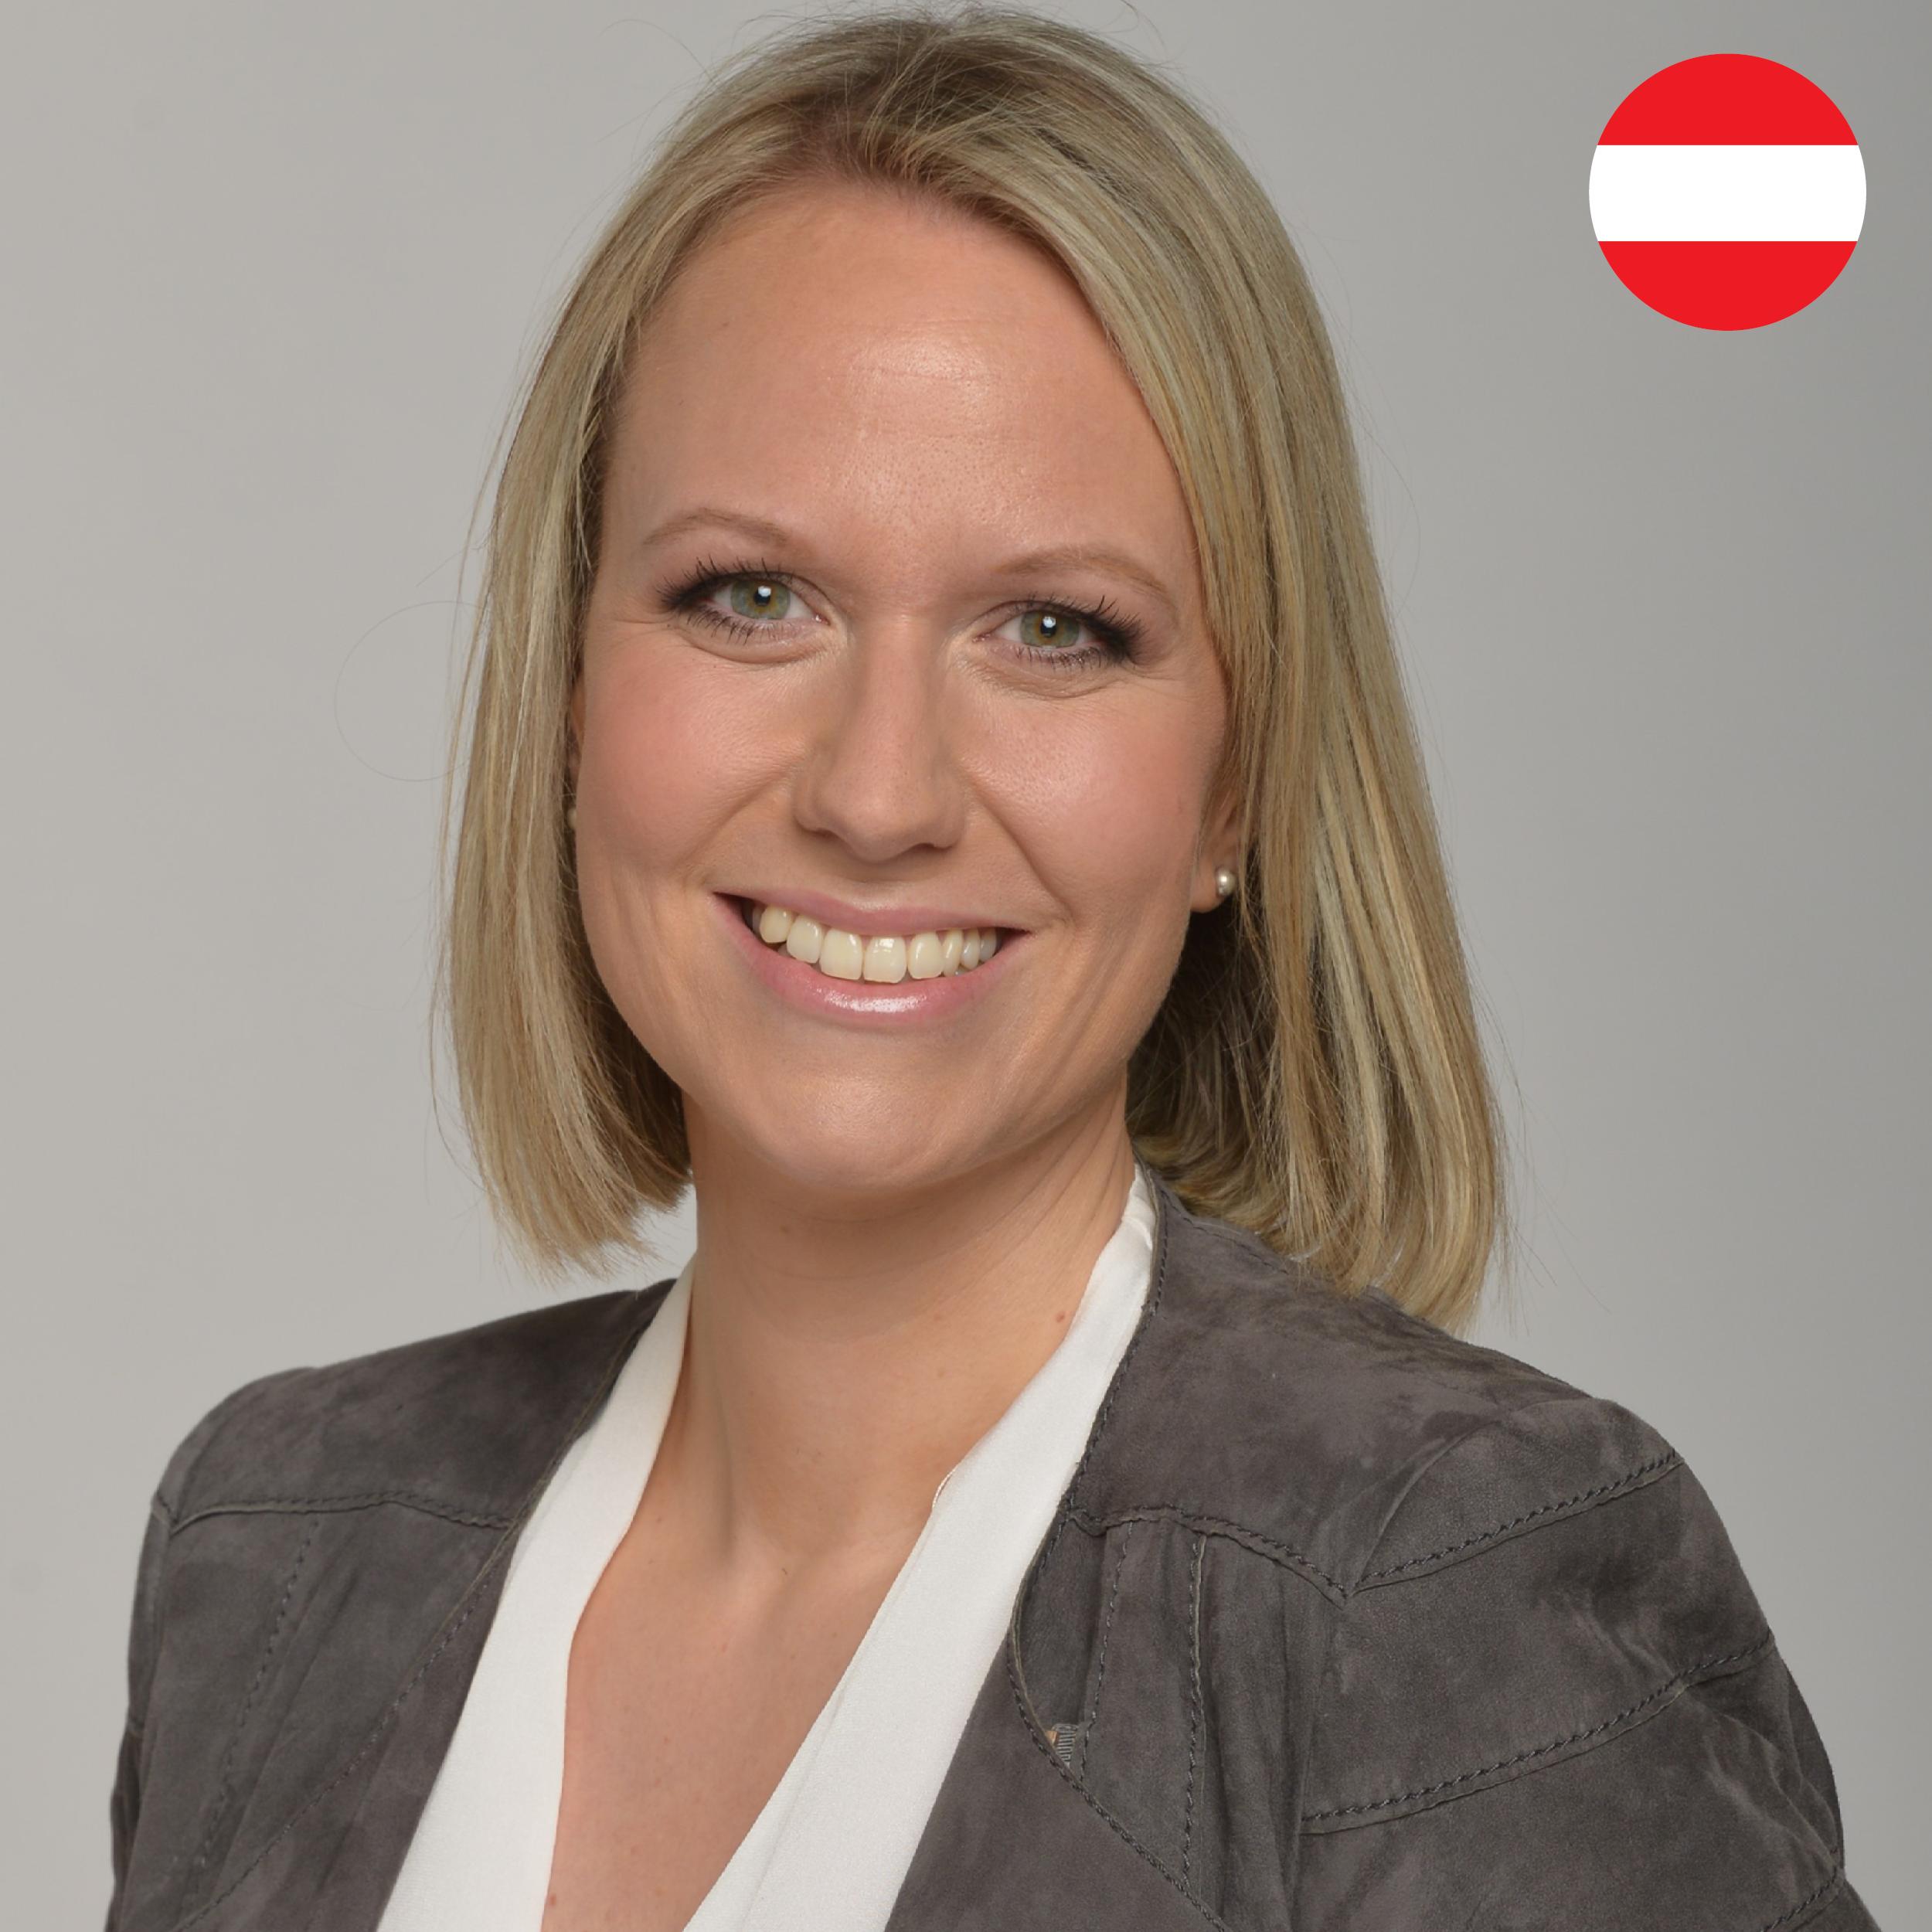 Daniela Soykan